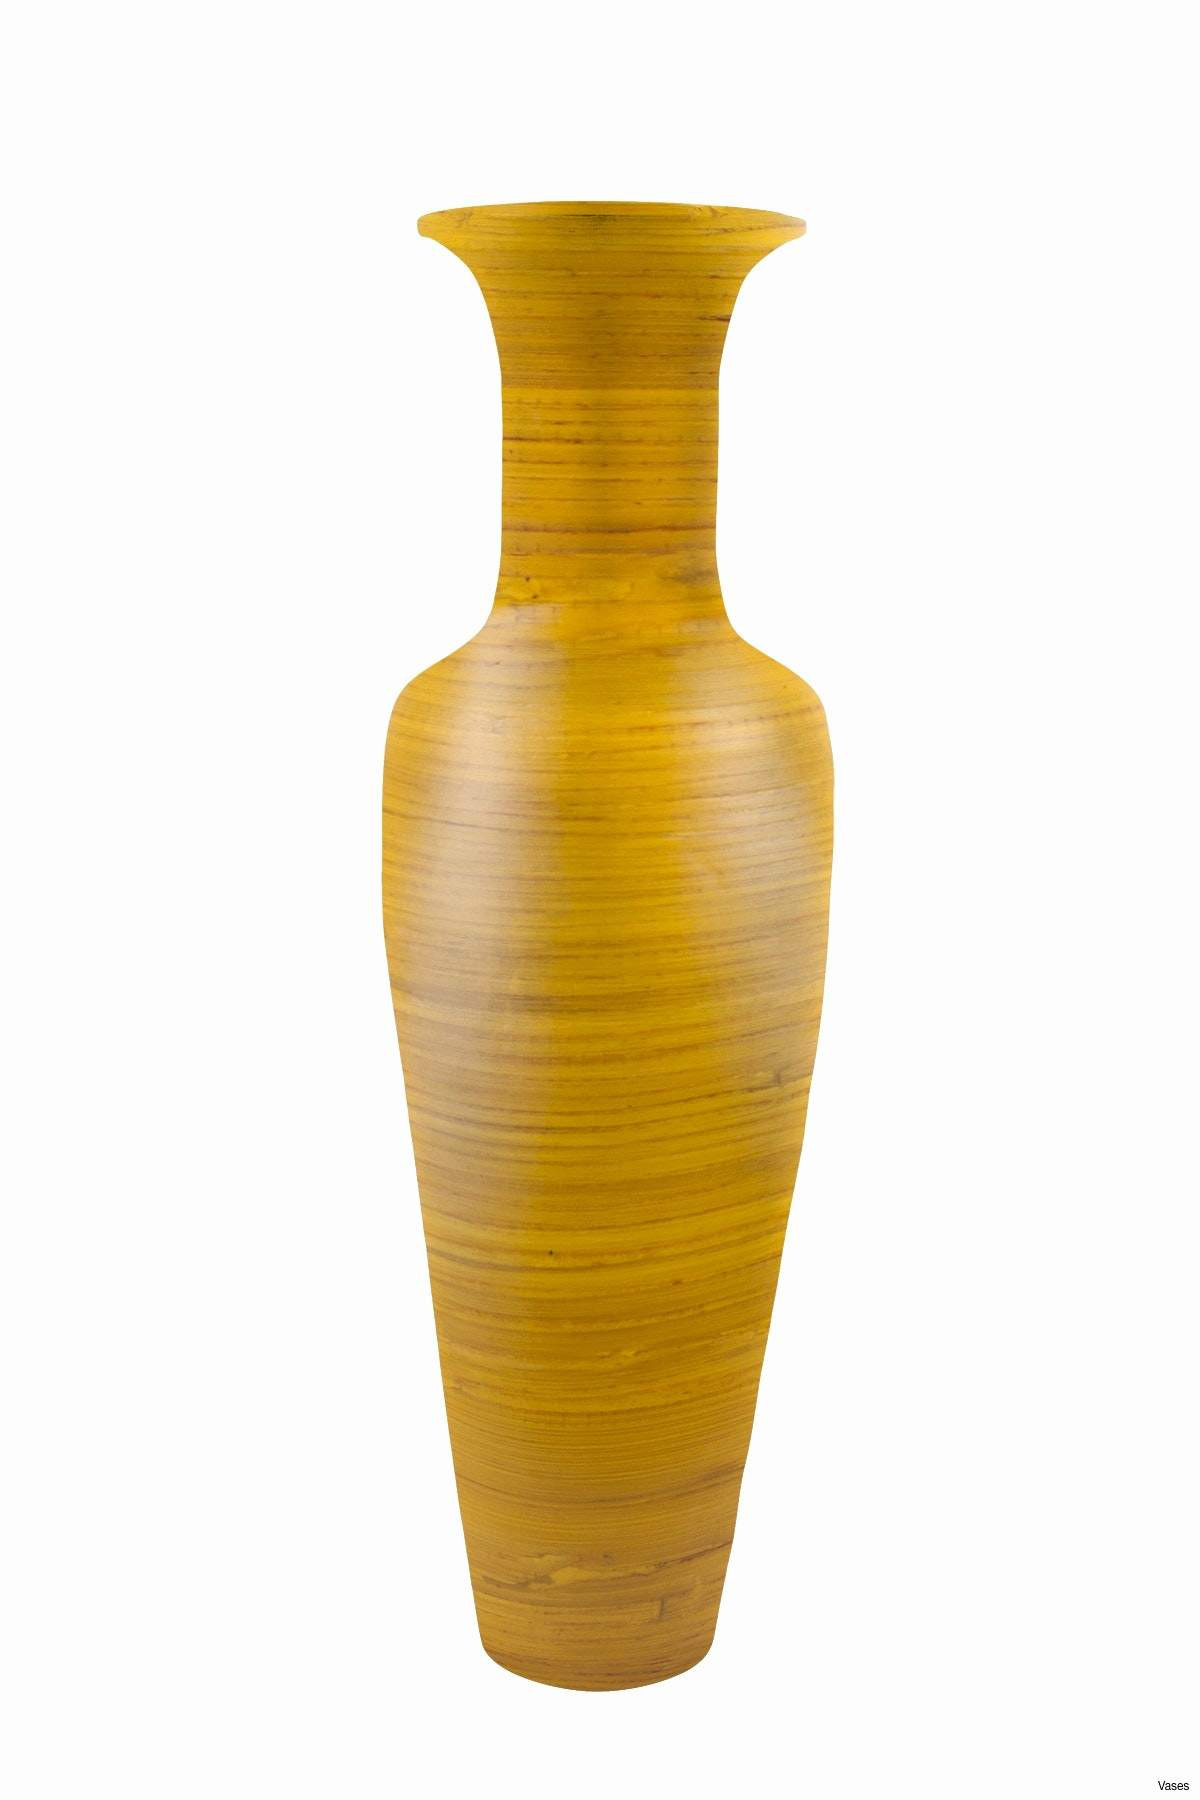 pottery barn bud vases of vase sets of 3 gallery area floor rugs new joaquin gray vases set 3 inside area floor rugs new joaquin gray vases set 3 2h pottery floor i 0d natadola turquoise glass